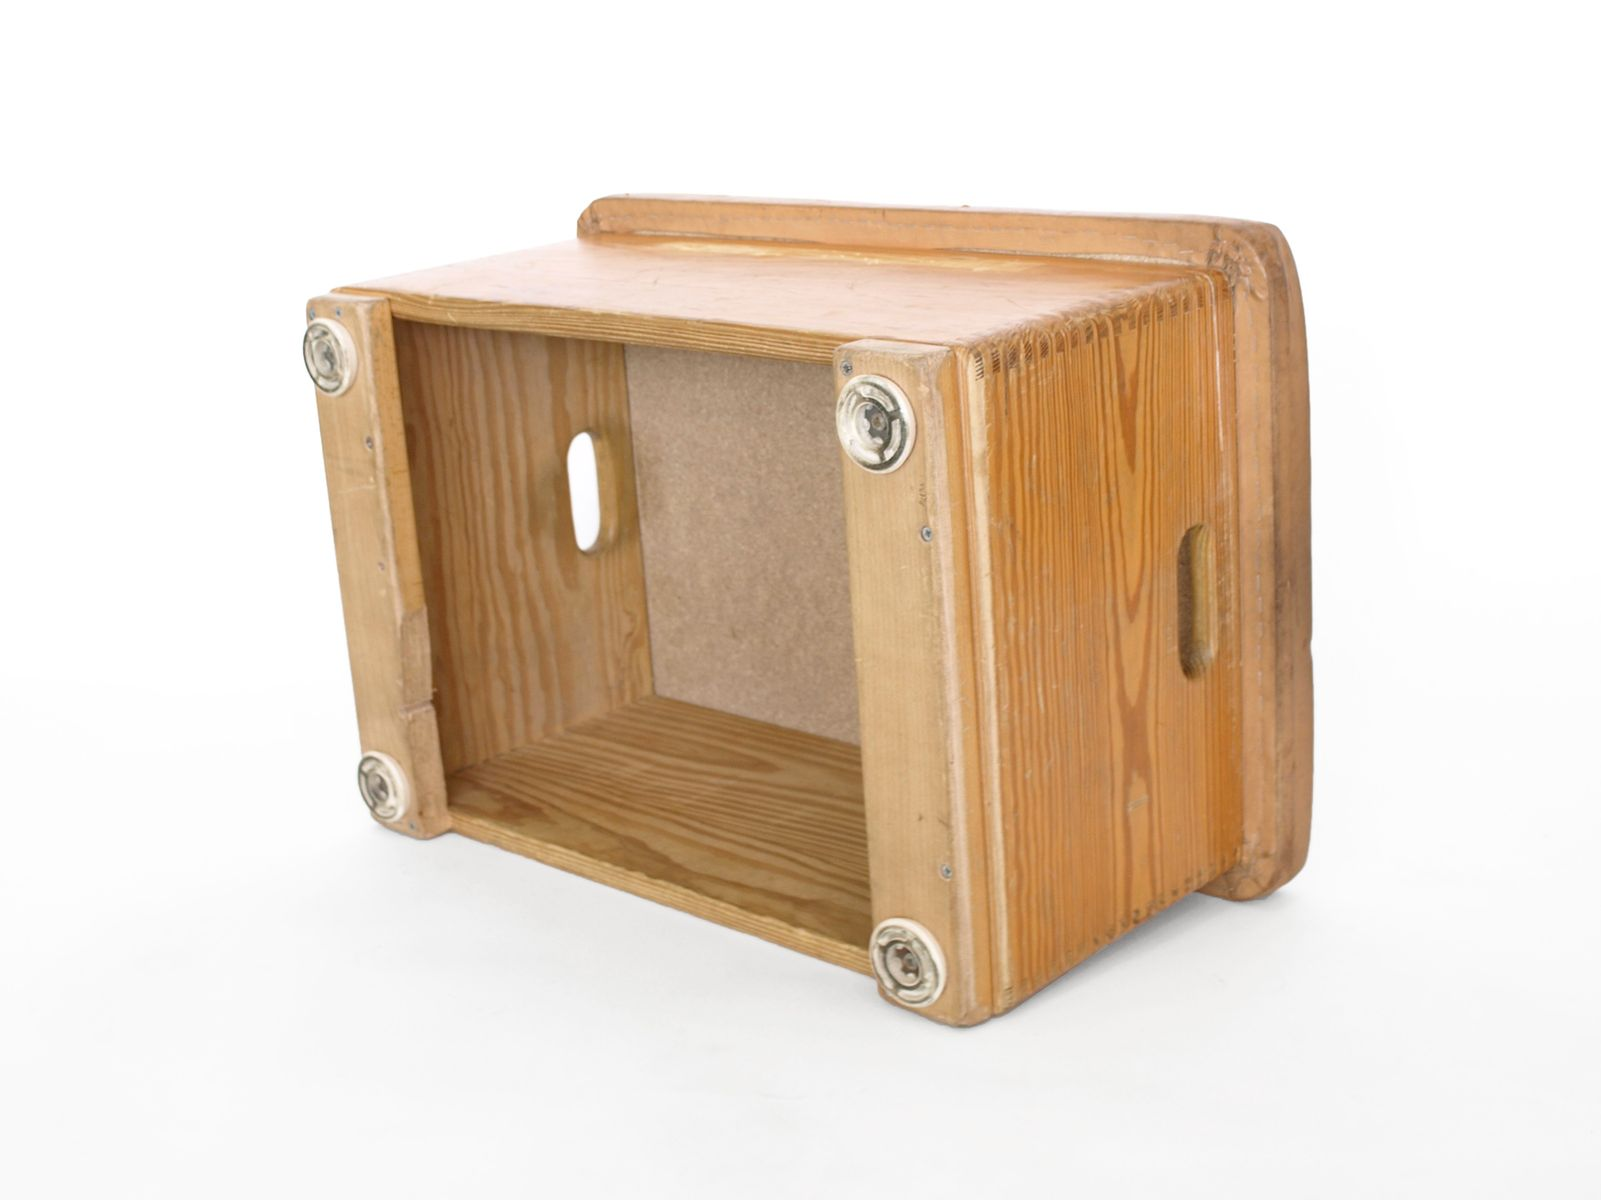 vintage turnkasten 1980er bei pamono kaufen. Black Bedroom Furniture Sets. Home Design Ideas